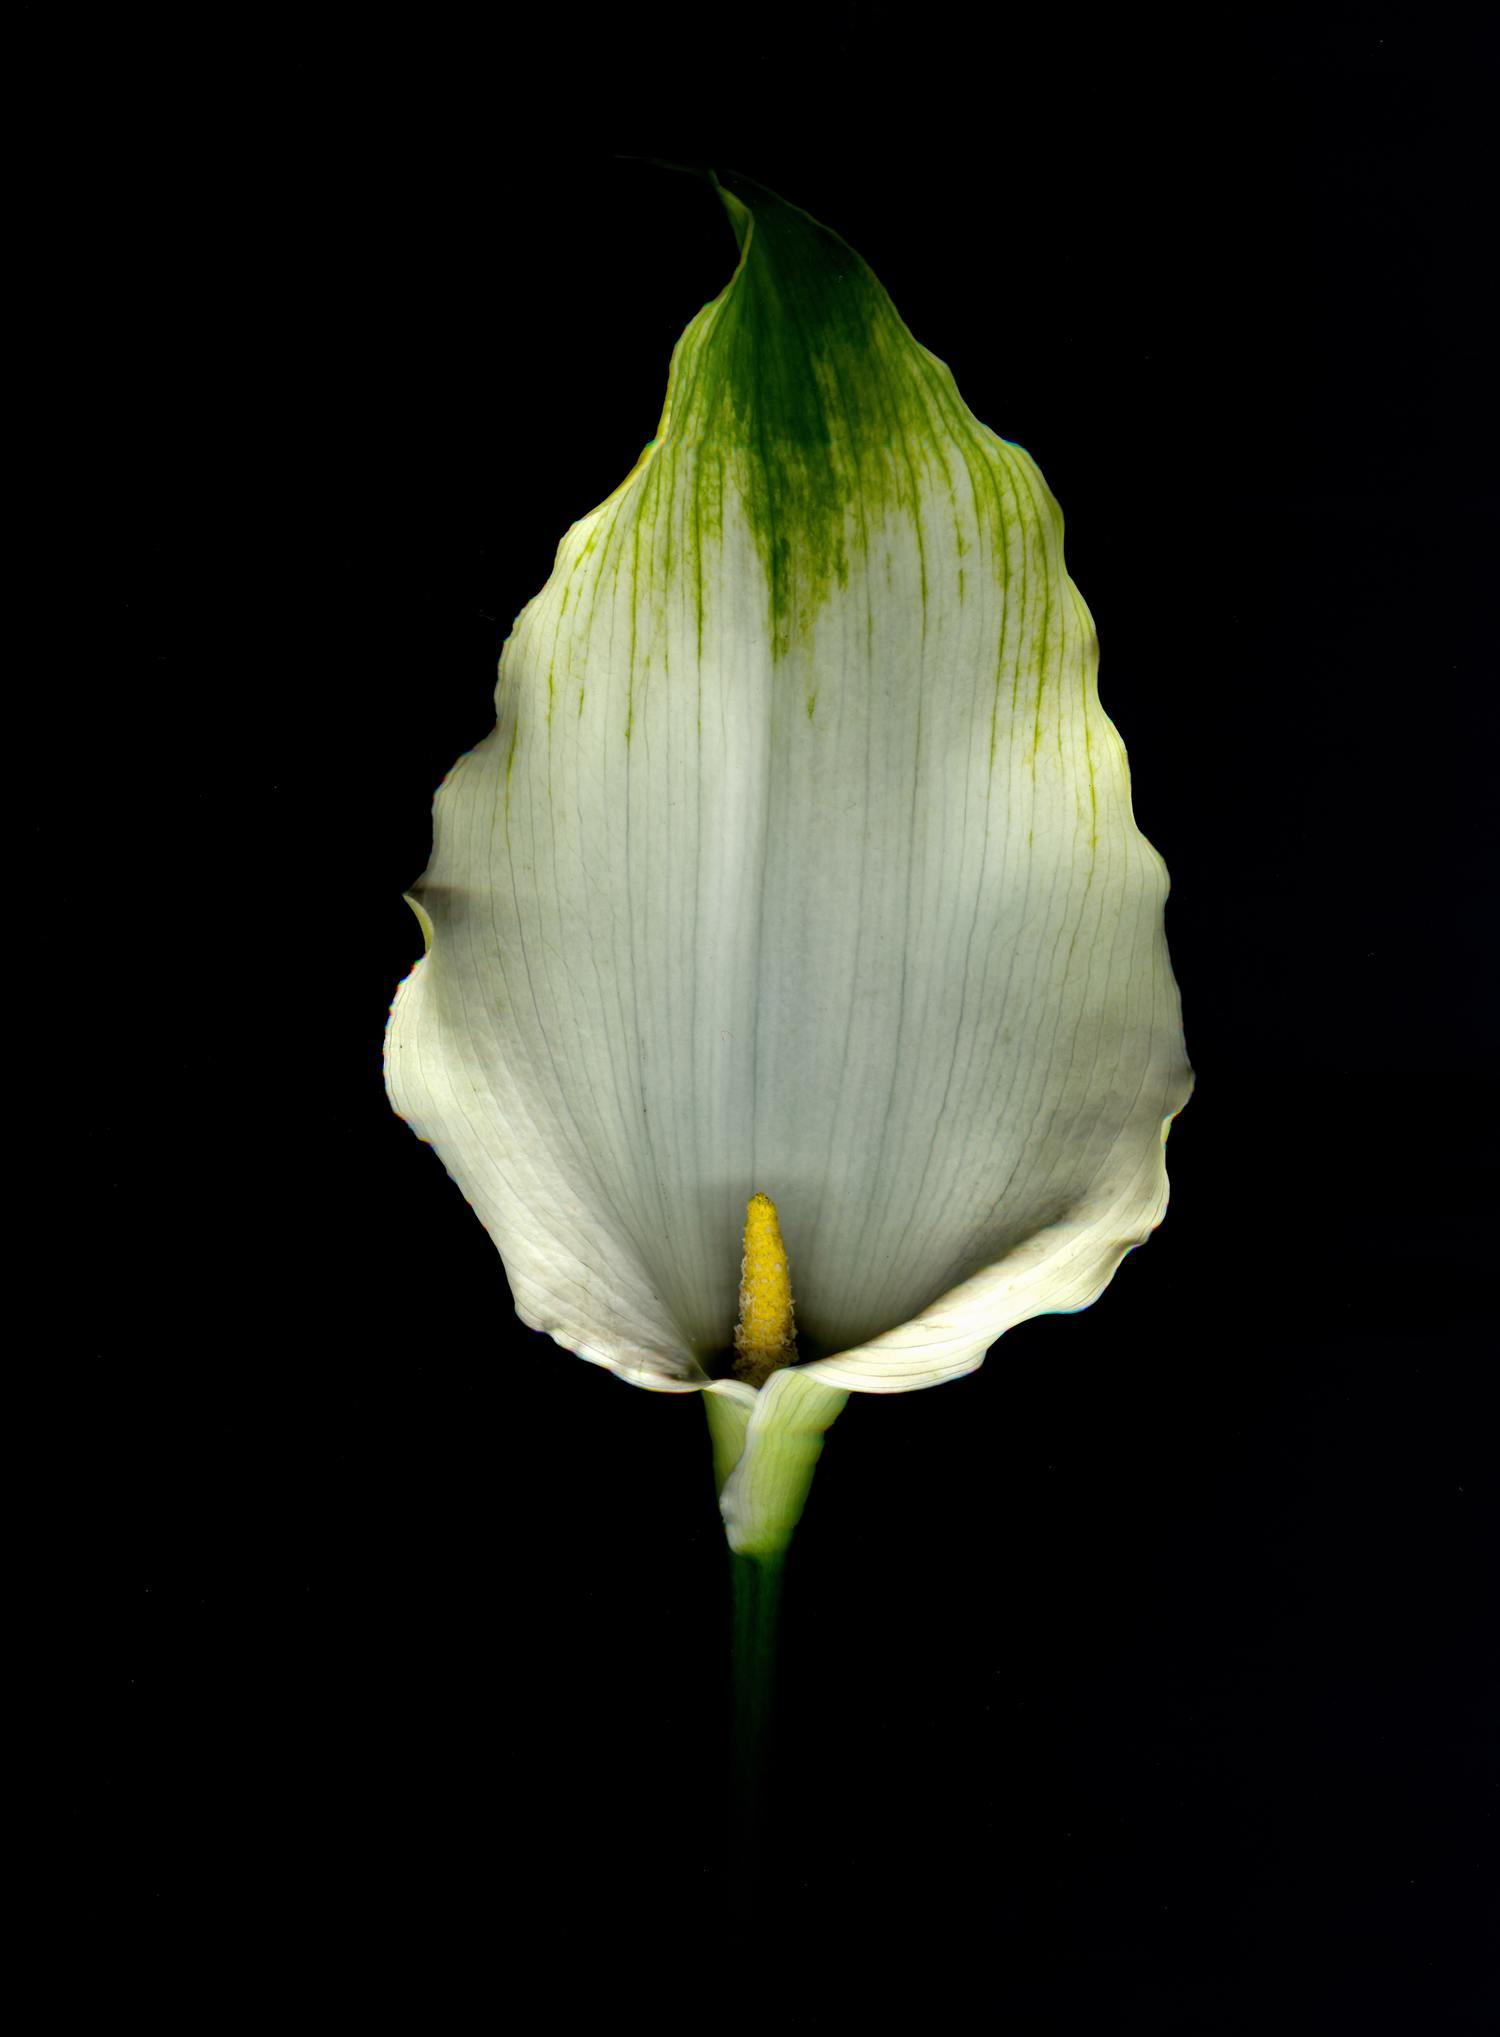 Flor con fondo negro